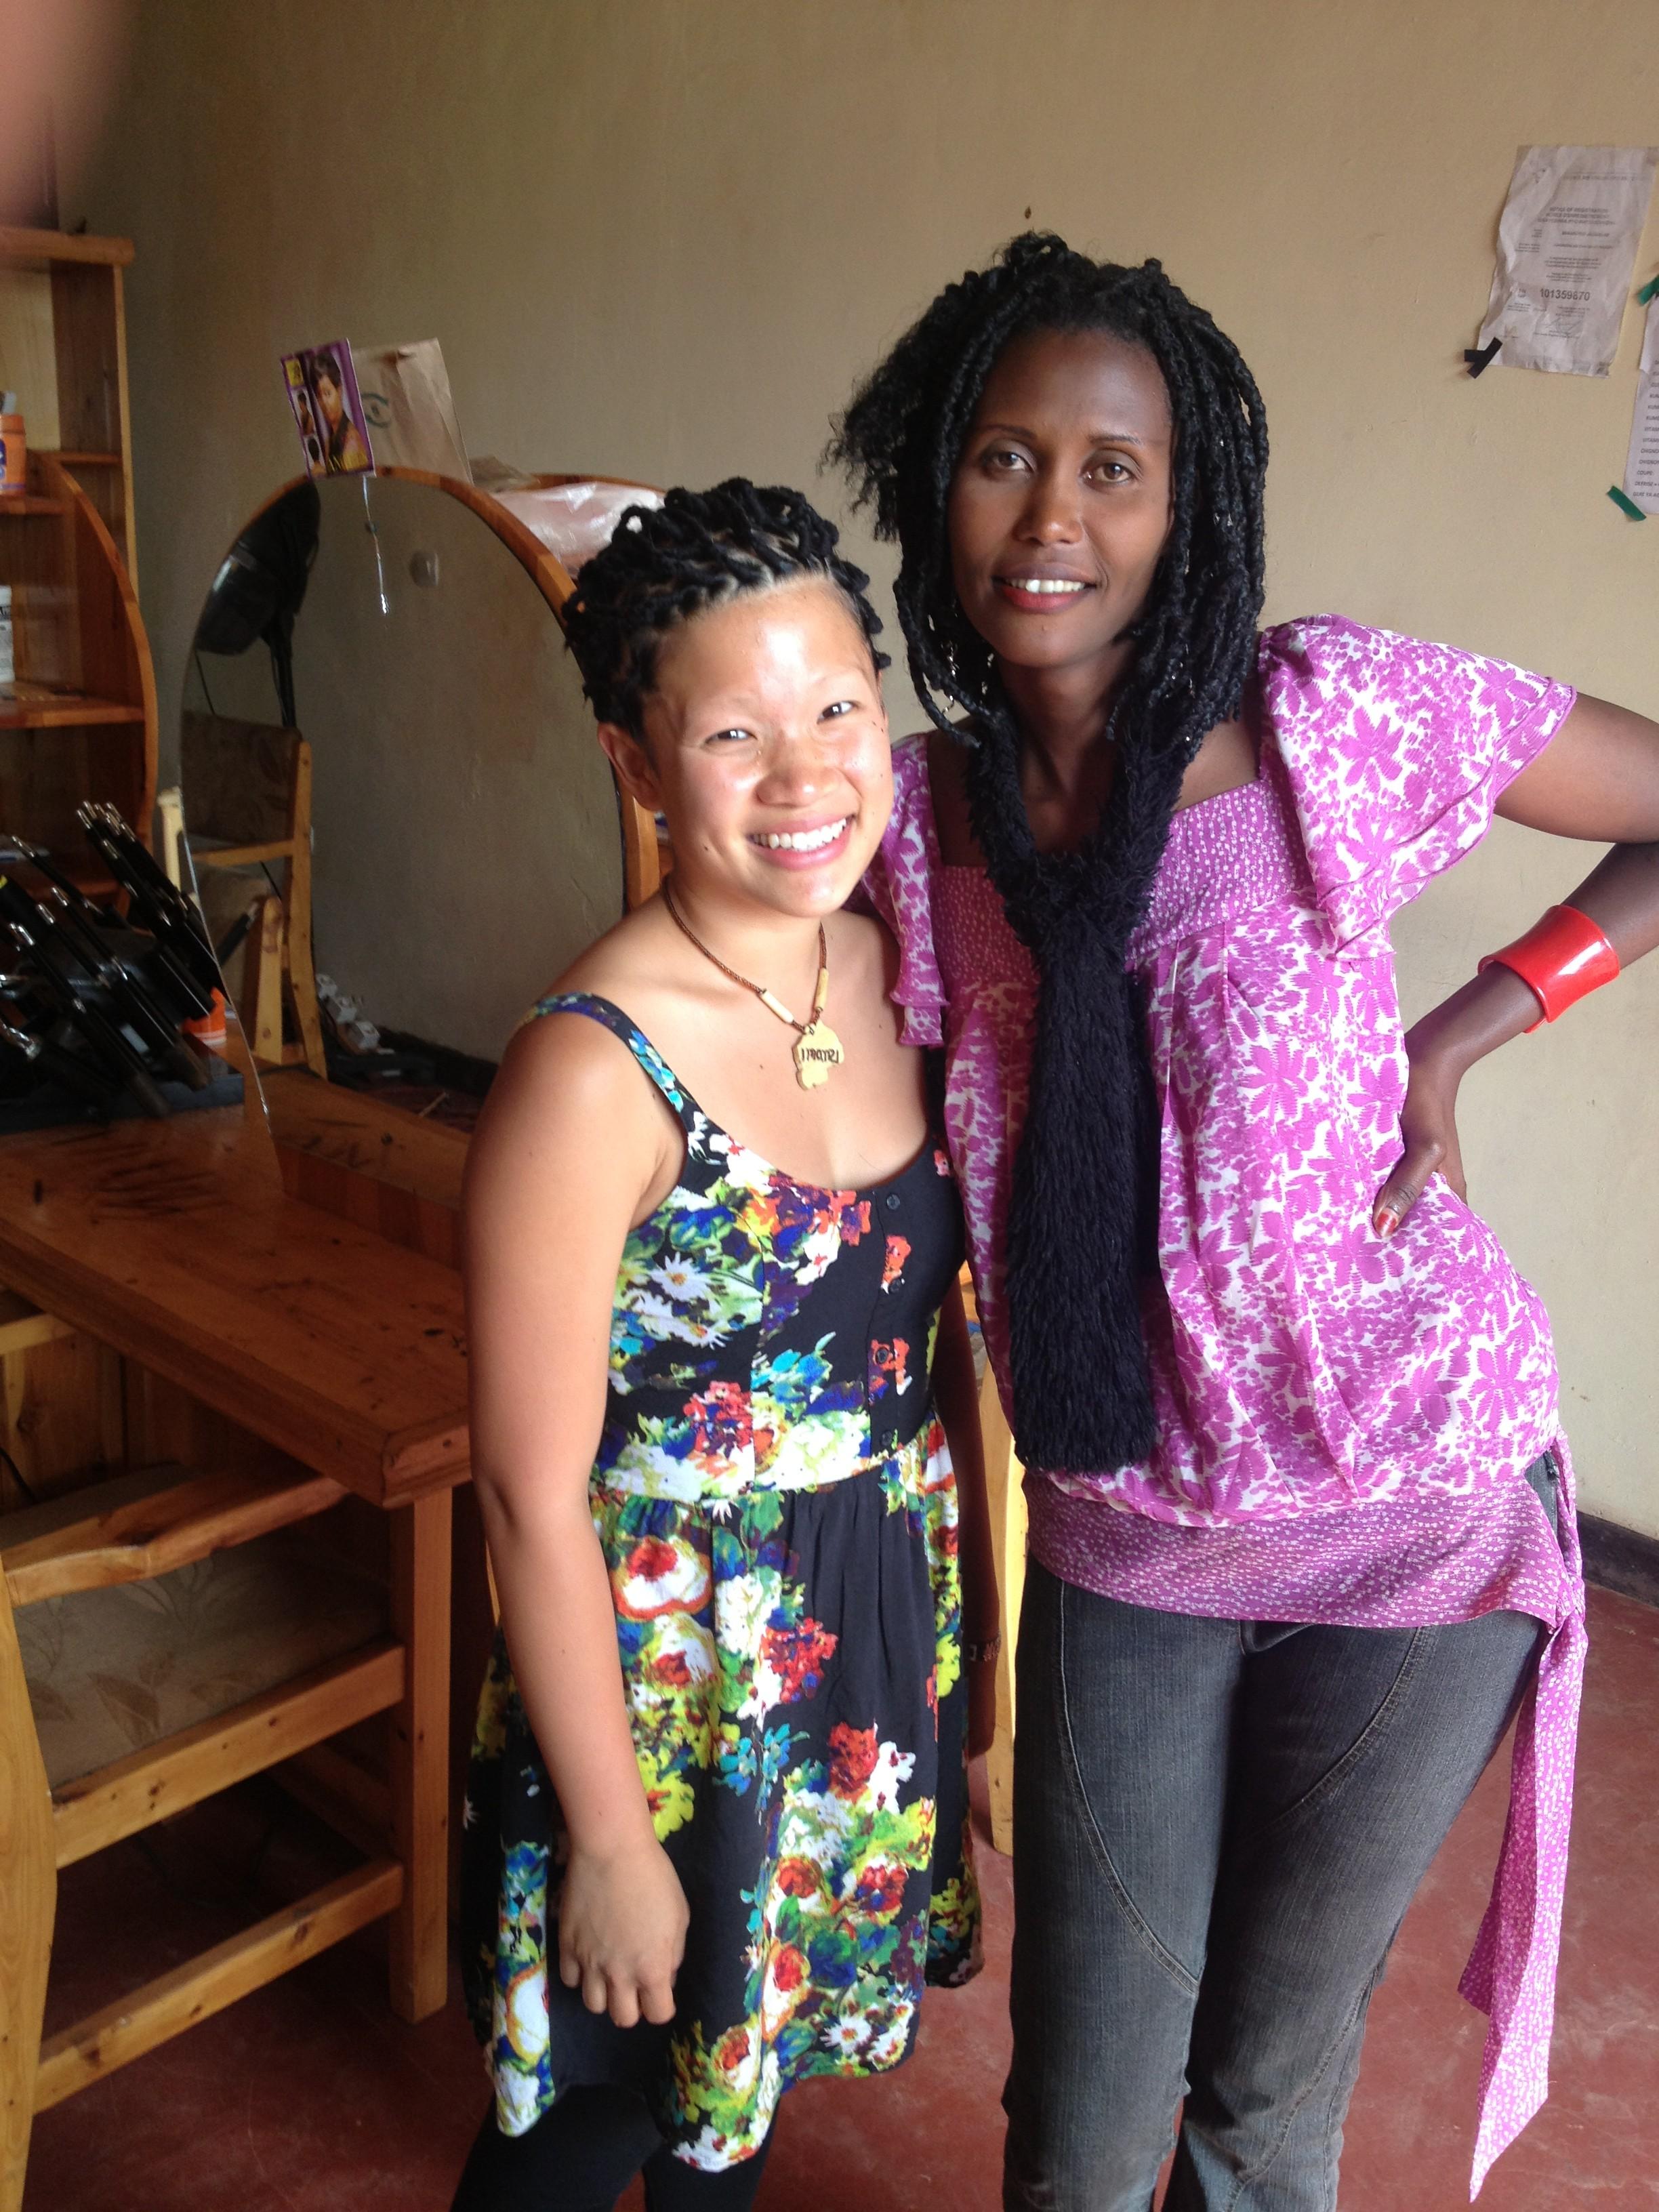 Lye Chings Summer Adventures Prague And Rwanda